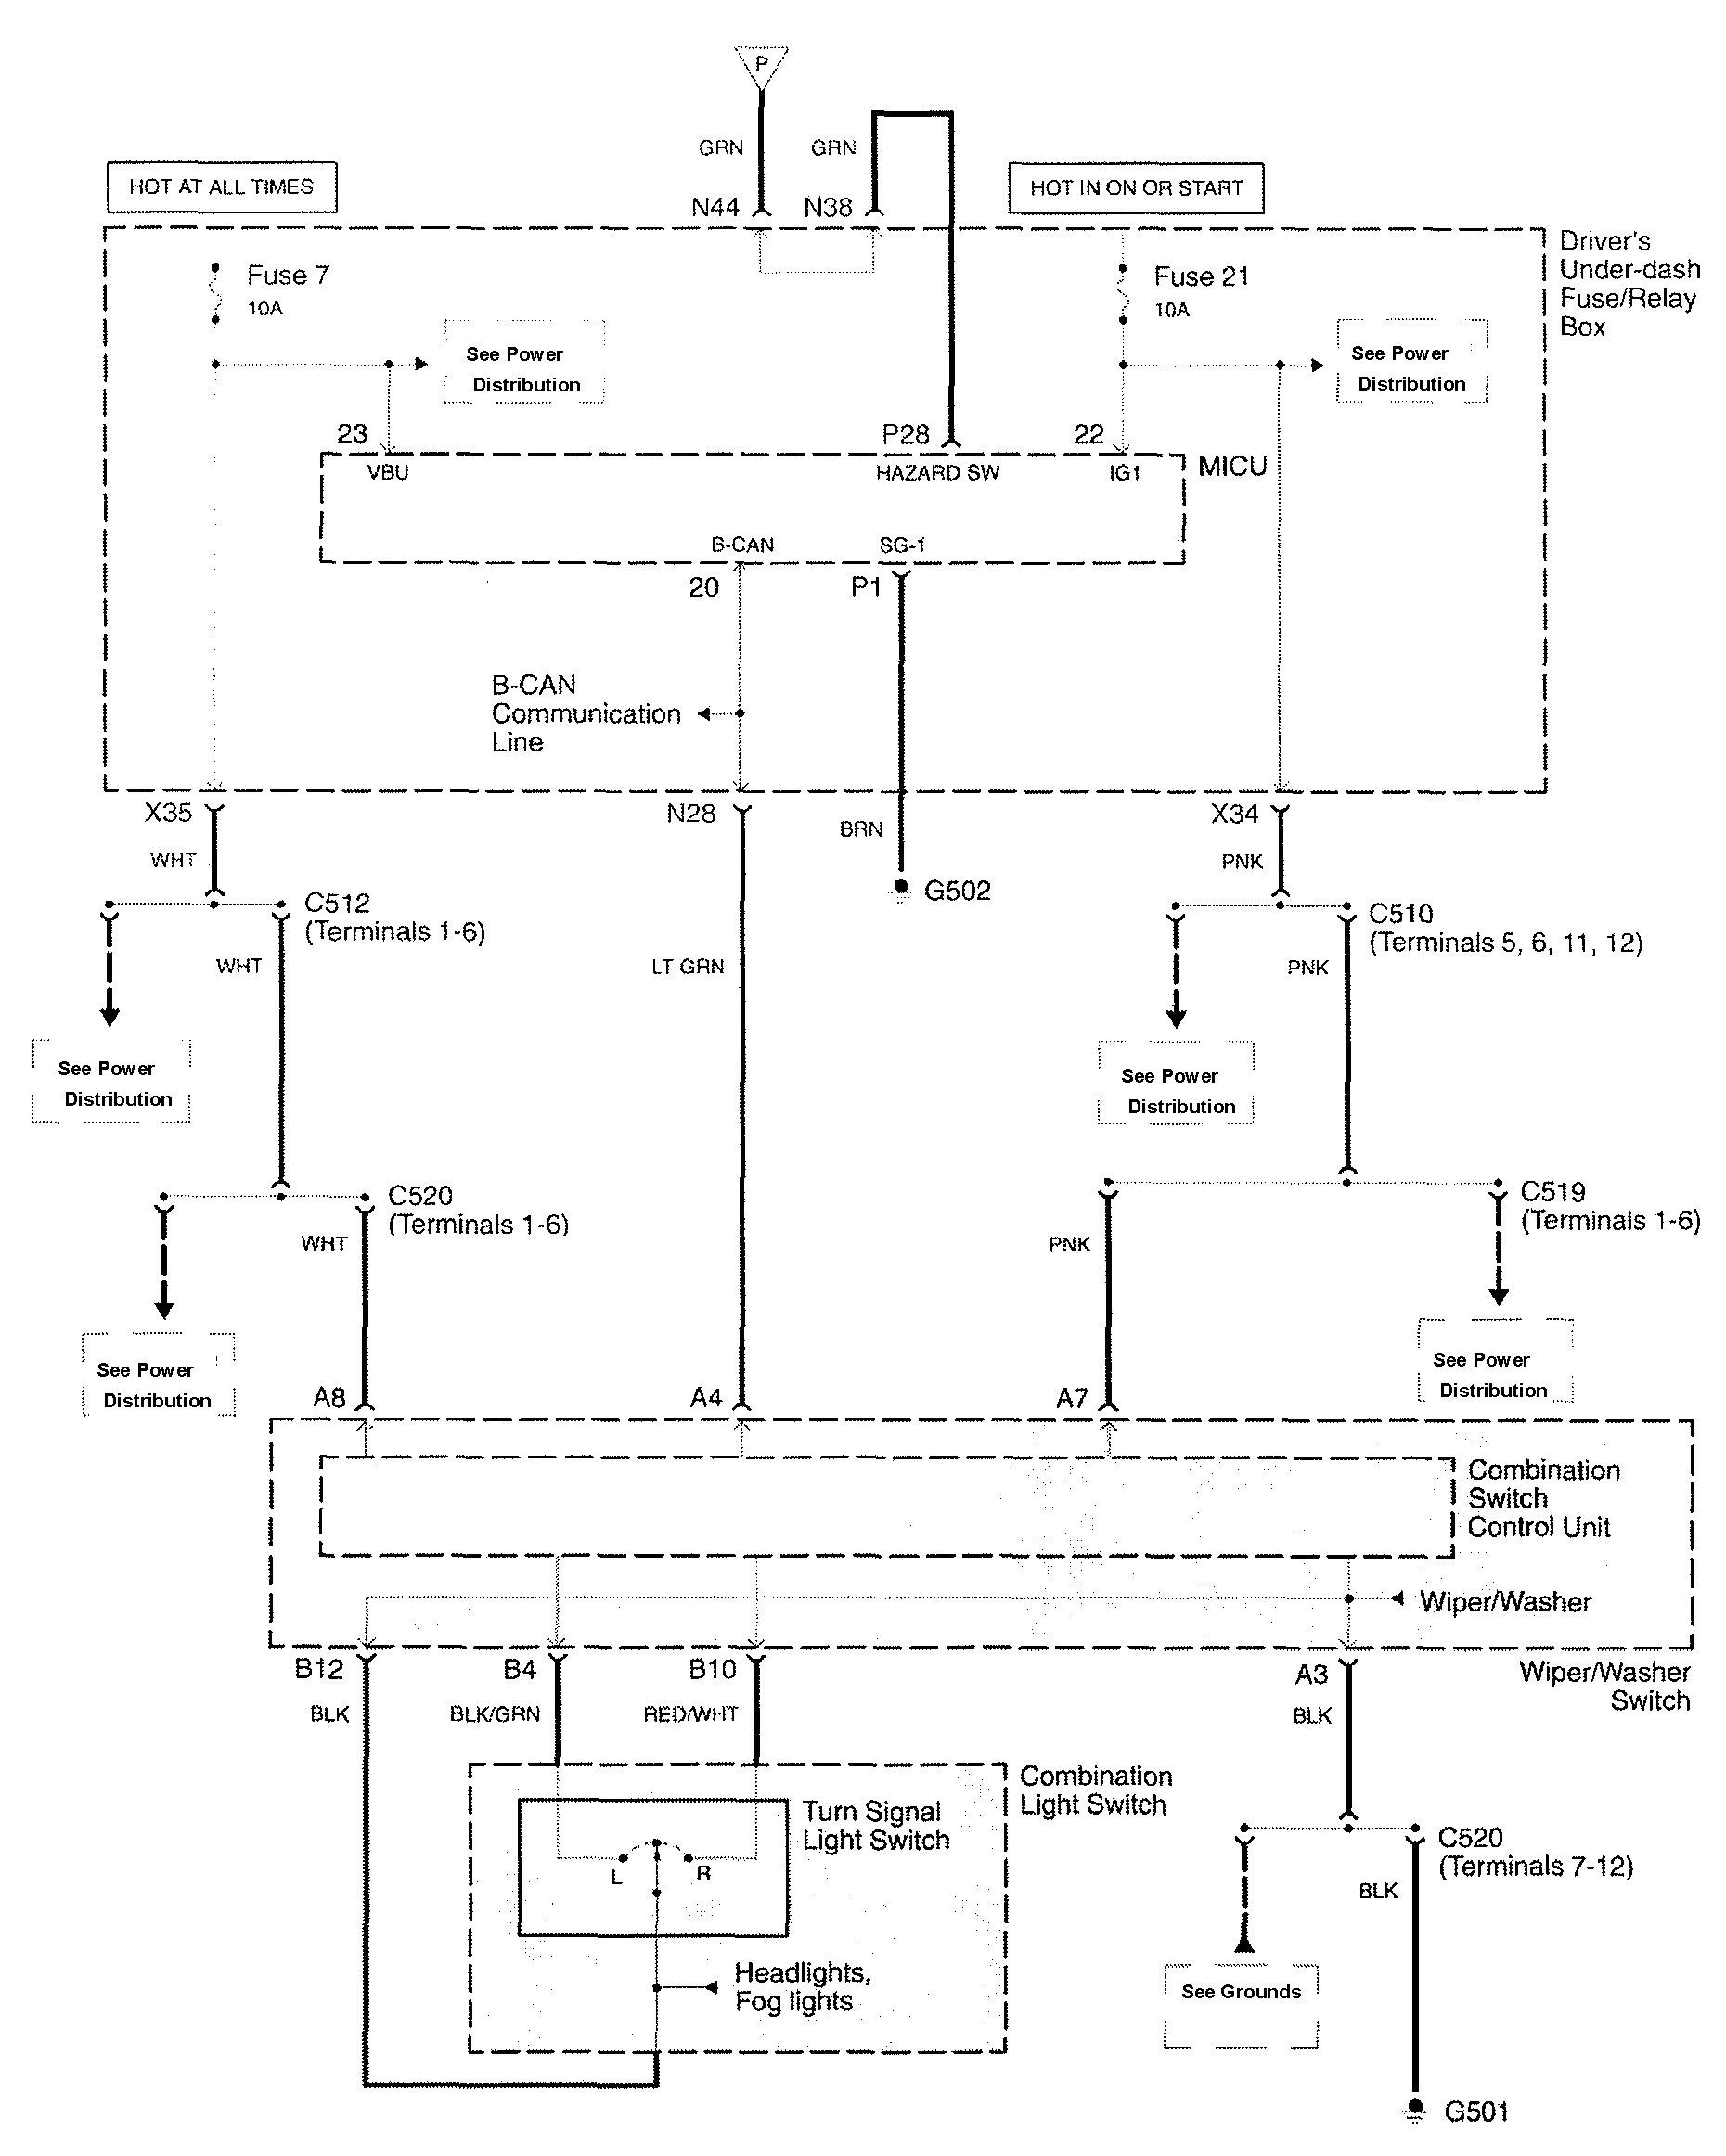 Wiring Diagram Exterior Lighting : Acura rl wiring diagrams exterior lighting